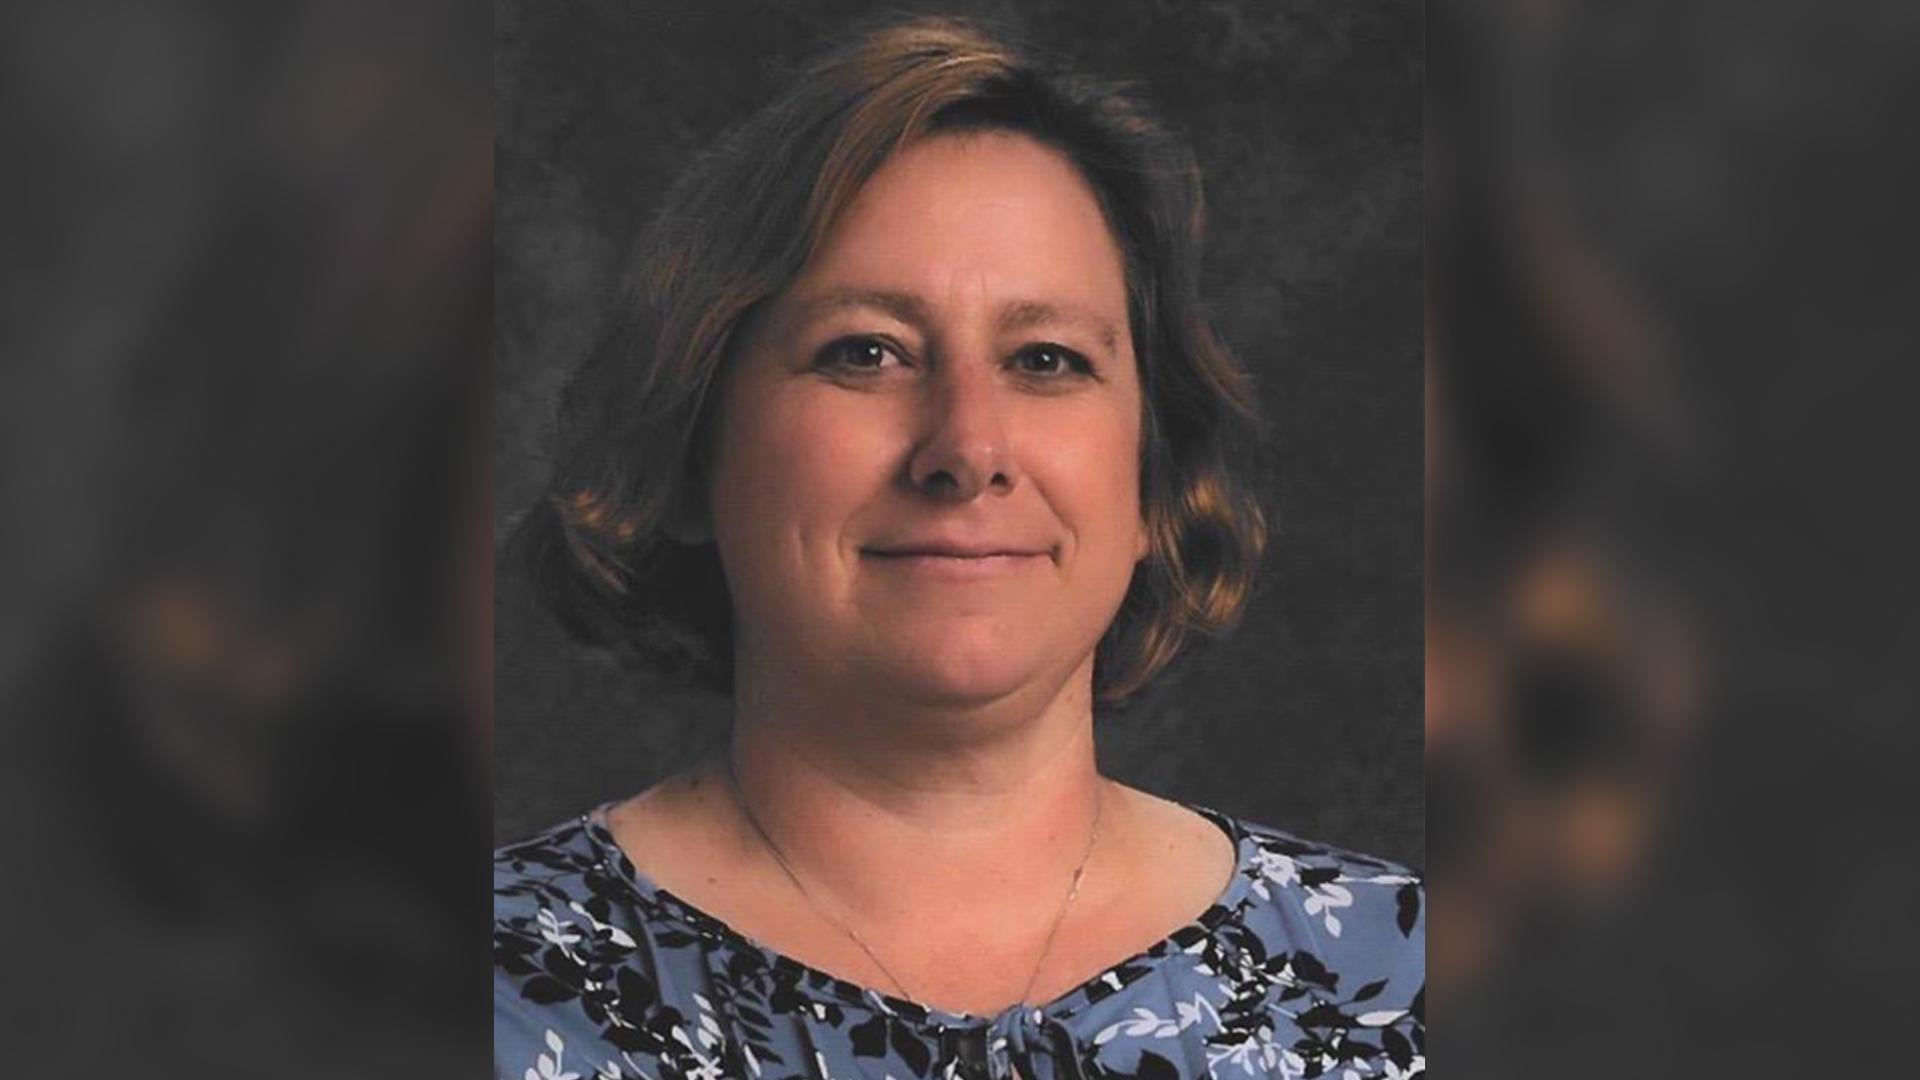 Authorities are still investigating the tragic murder of Olney high school teacher Manuela Allen.